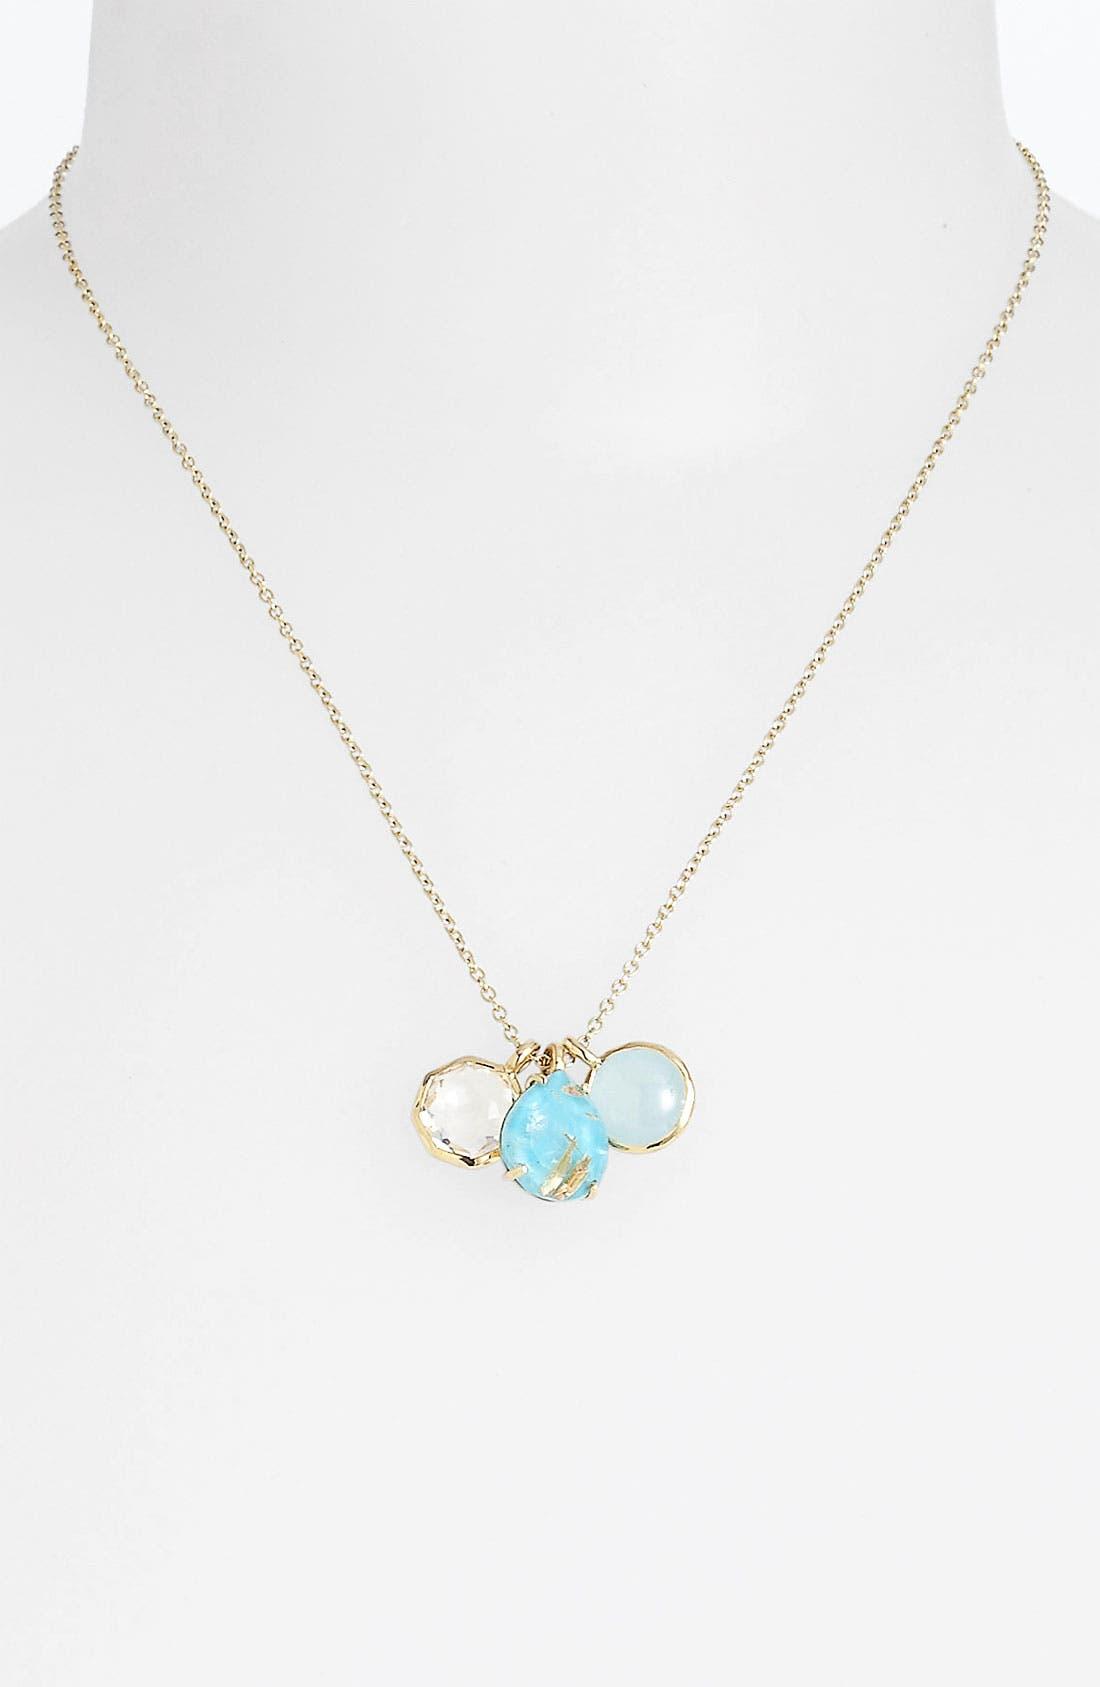 Alternate Image 1 Selected - Ippolita 'Rock Candy - Gelato' 18k Gold Cluster Pendant Necklace